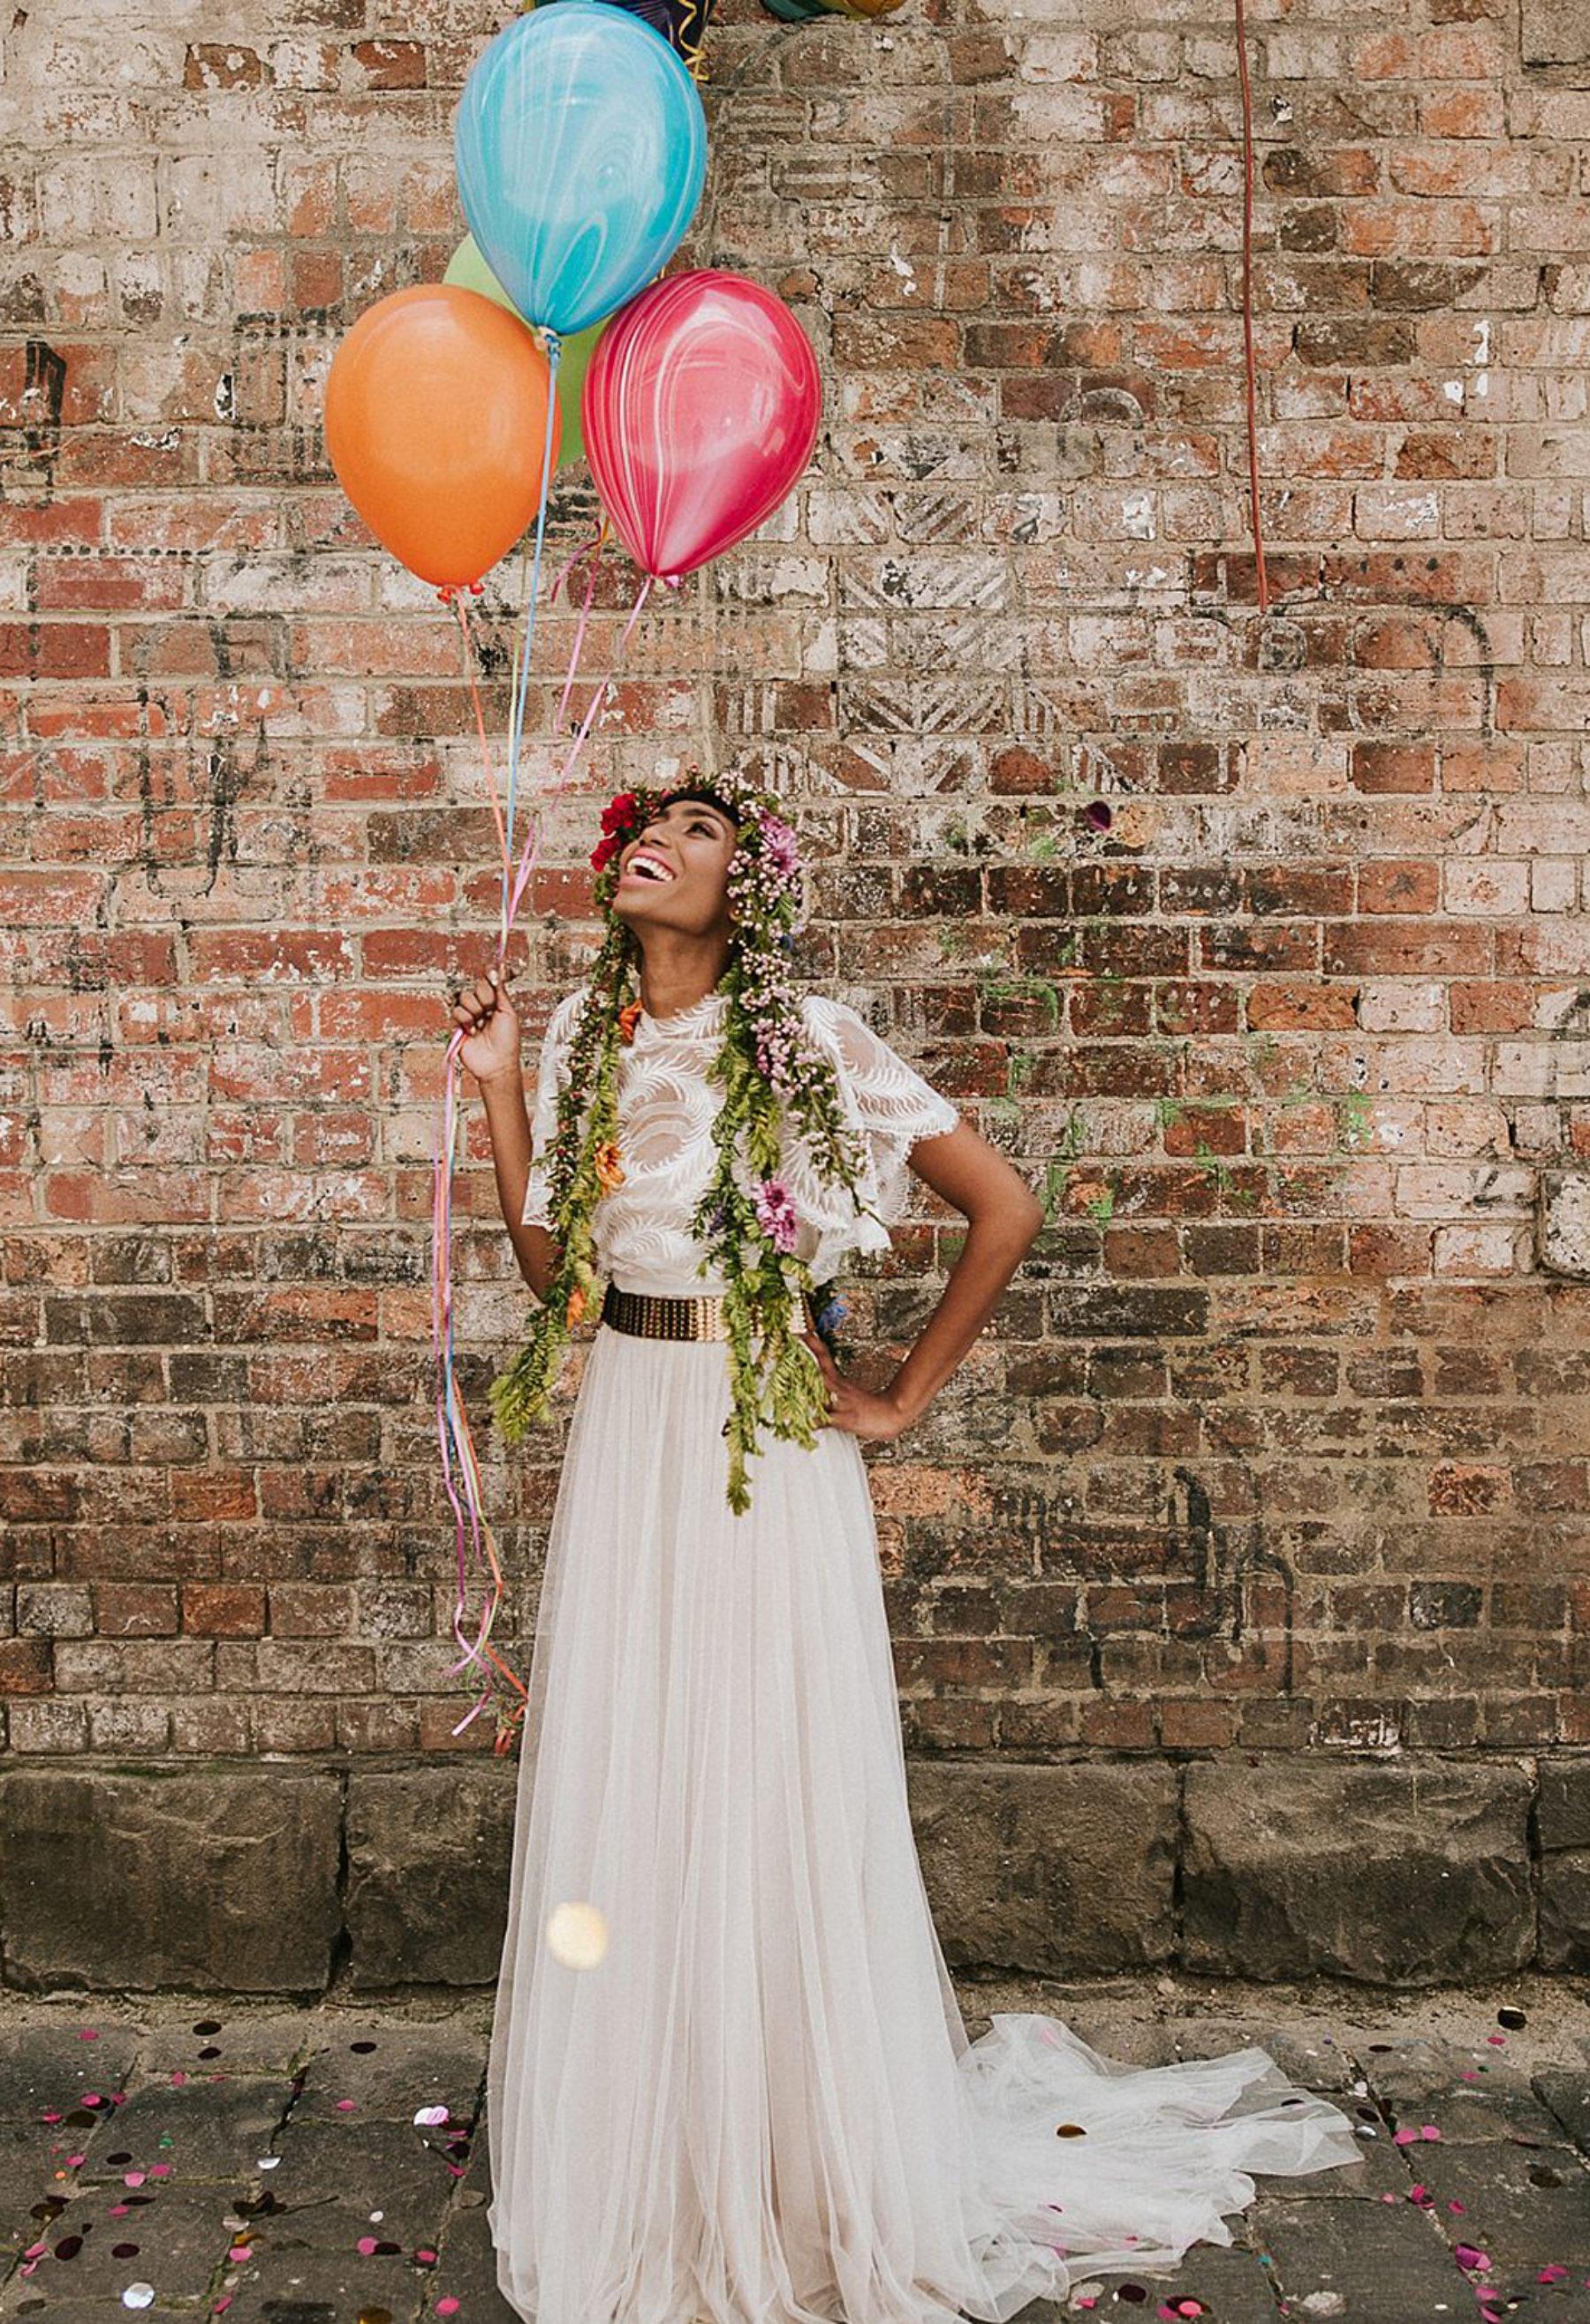 Warehouse wedding balloons styling